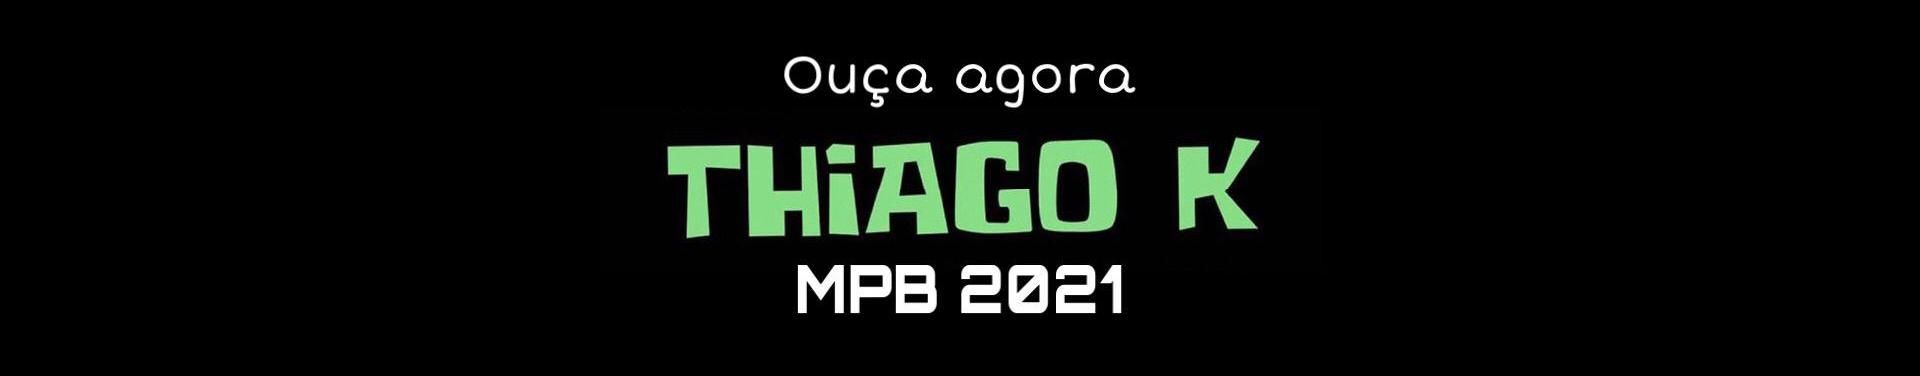 Imagem de capa de Thiago K